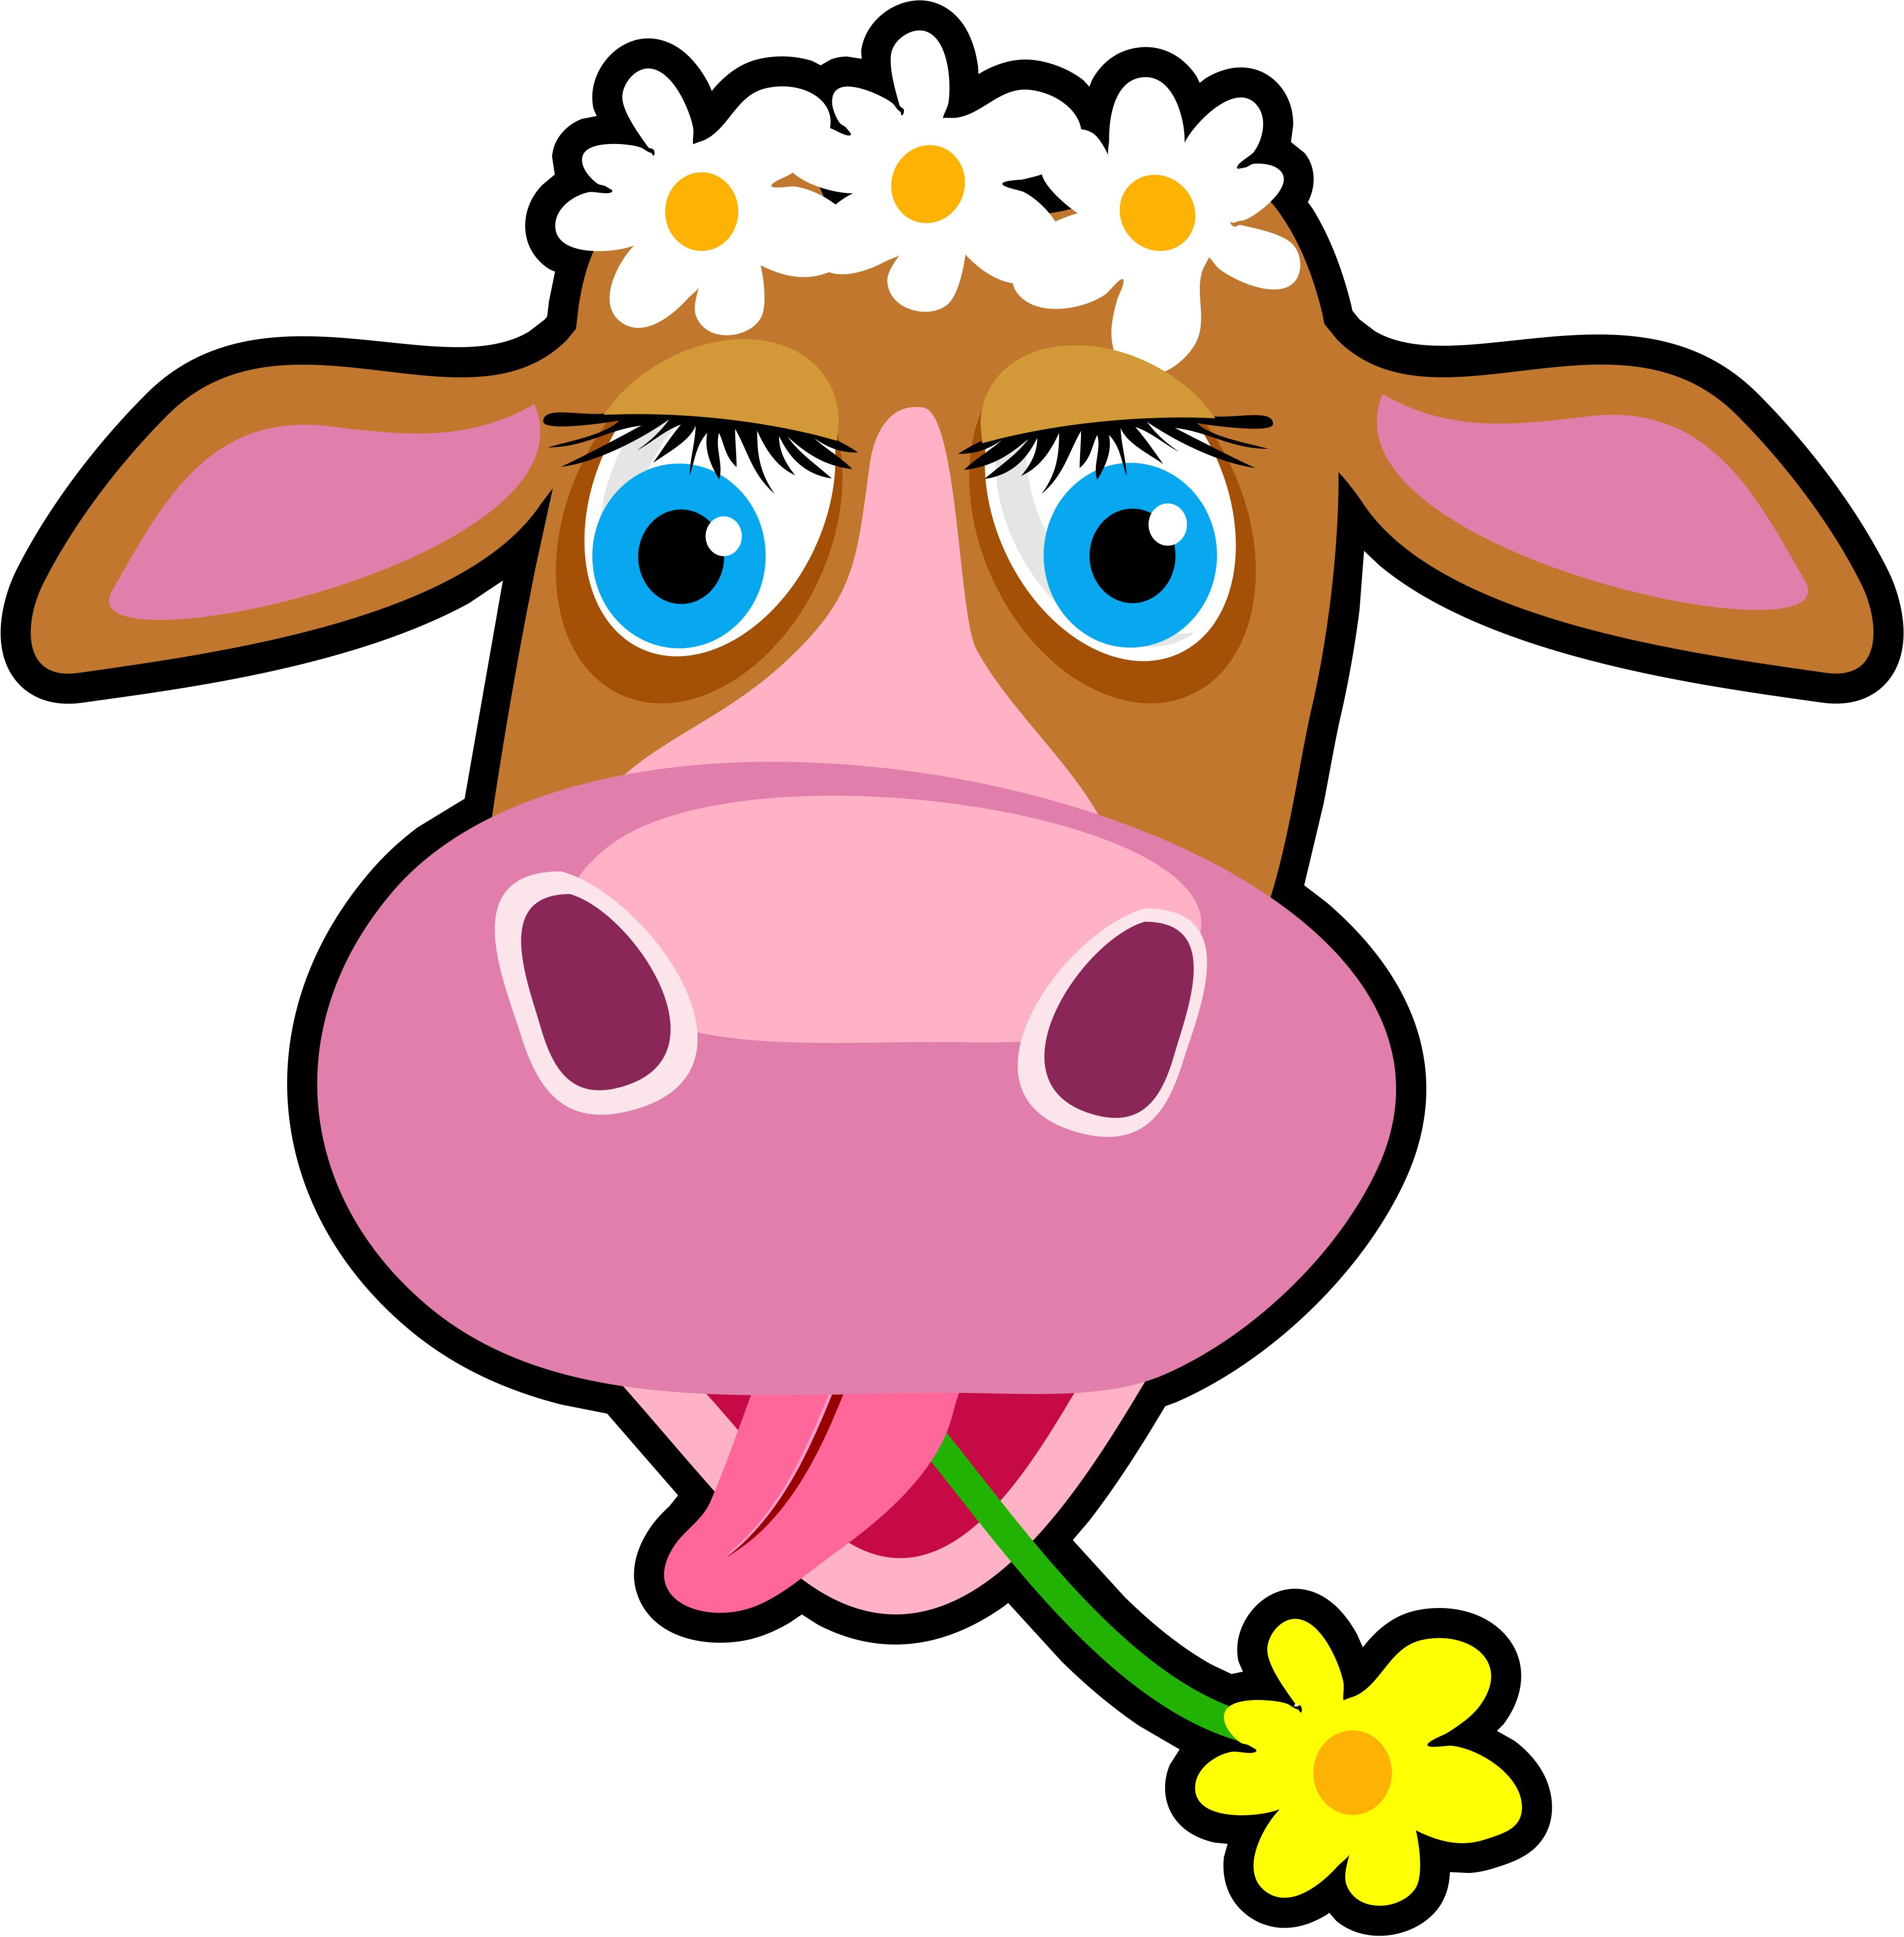 Dairy cow face clip art